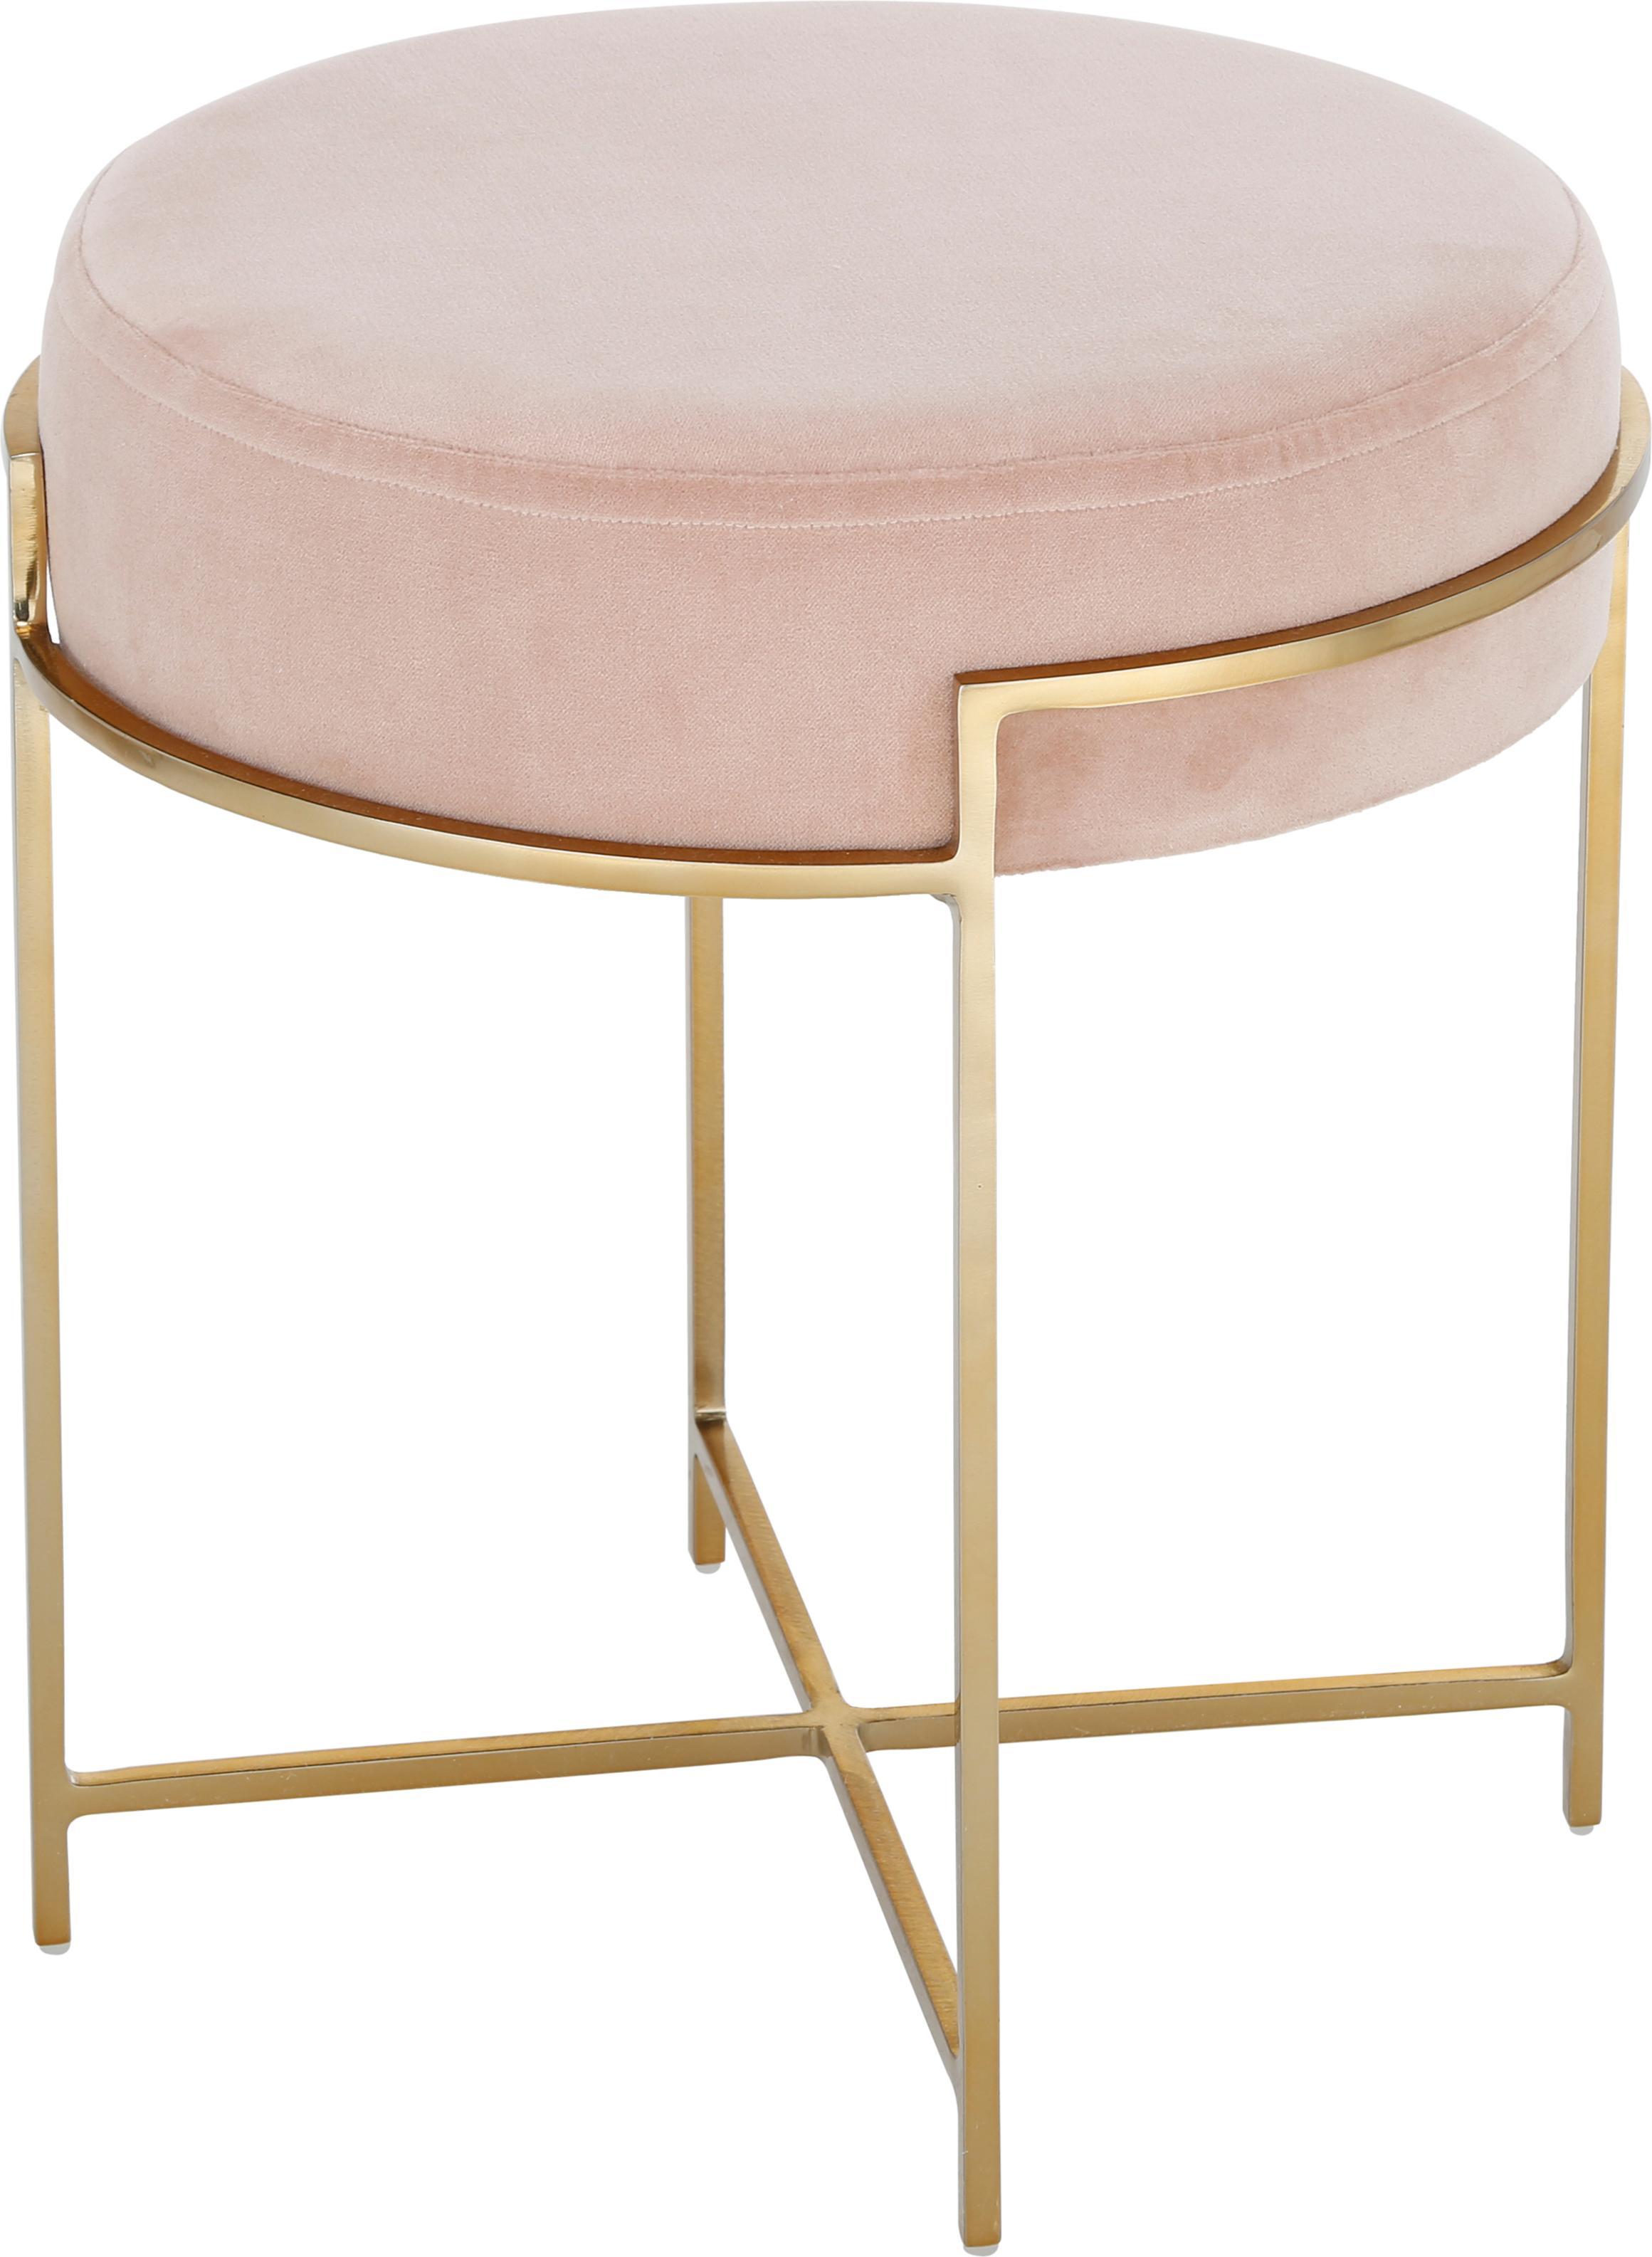 Samt-Hocker Madeleine mit Metallgestell, Bezug: Baumwollsamt, Bezug: RosaFuss: Goldfarben, matt, Ø 40 x H 45 cm